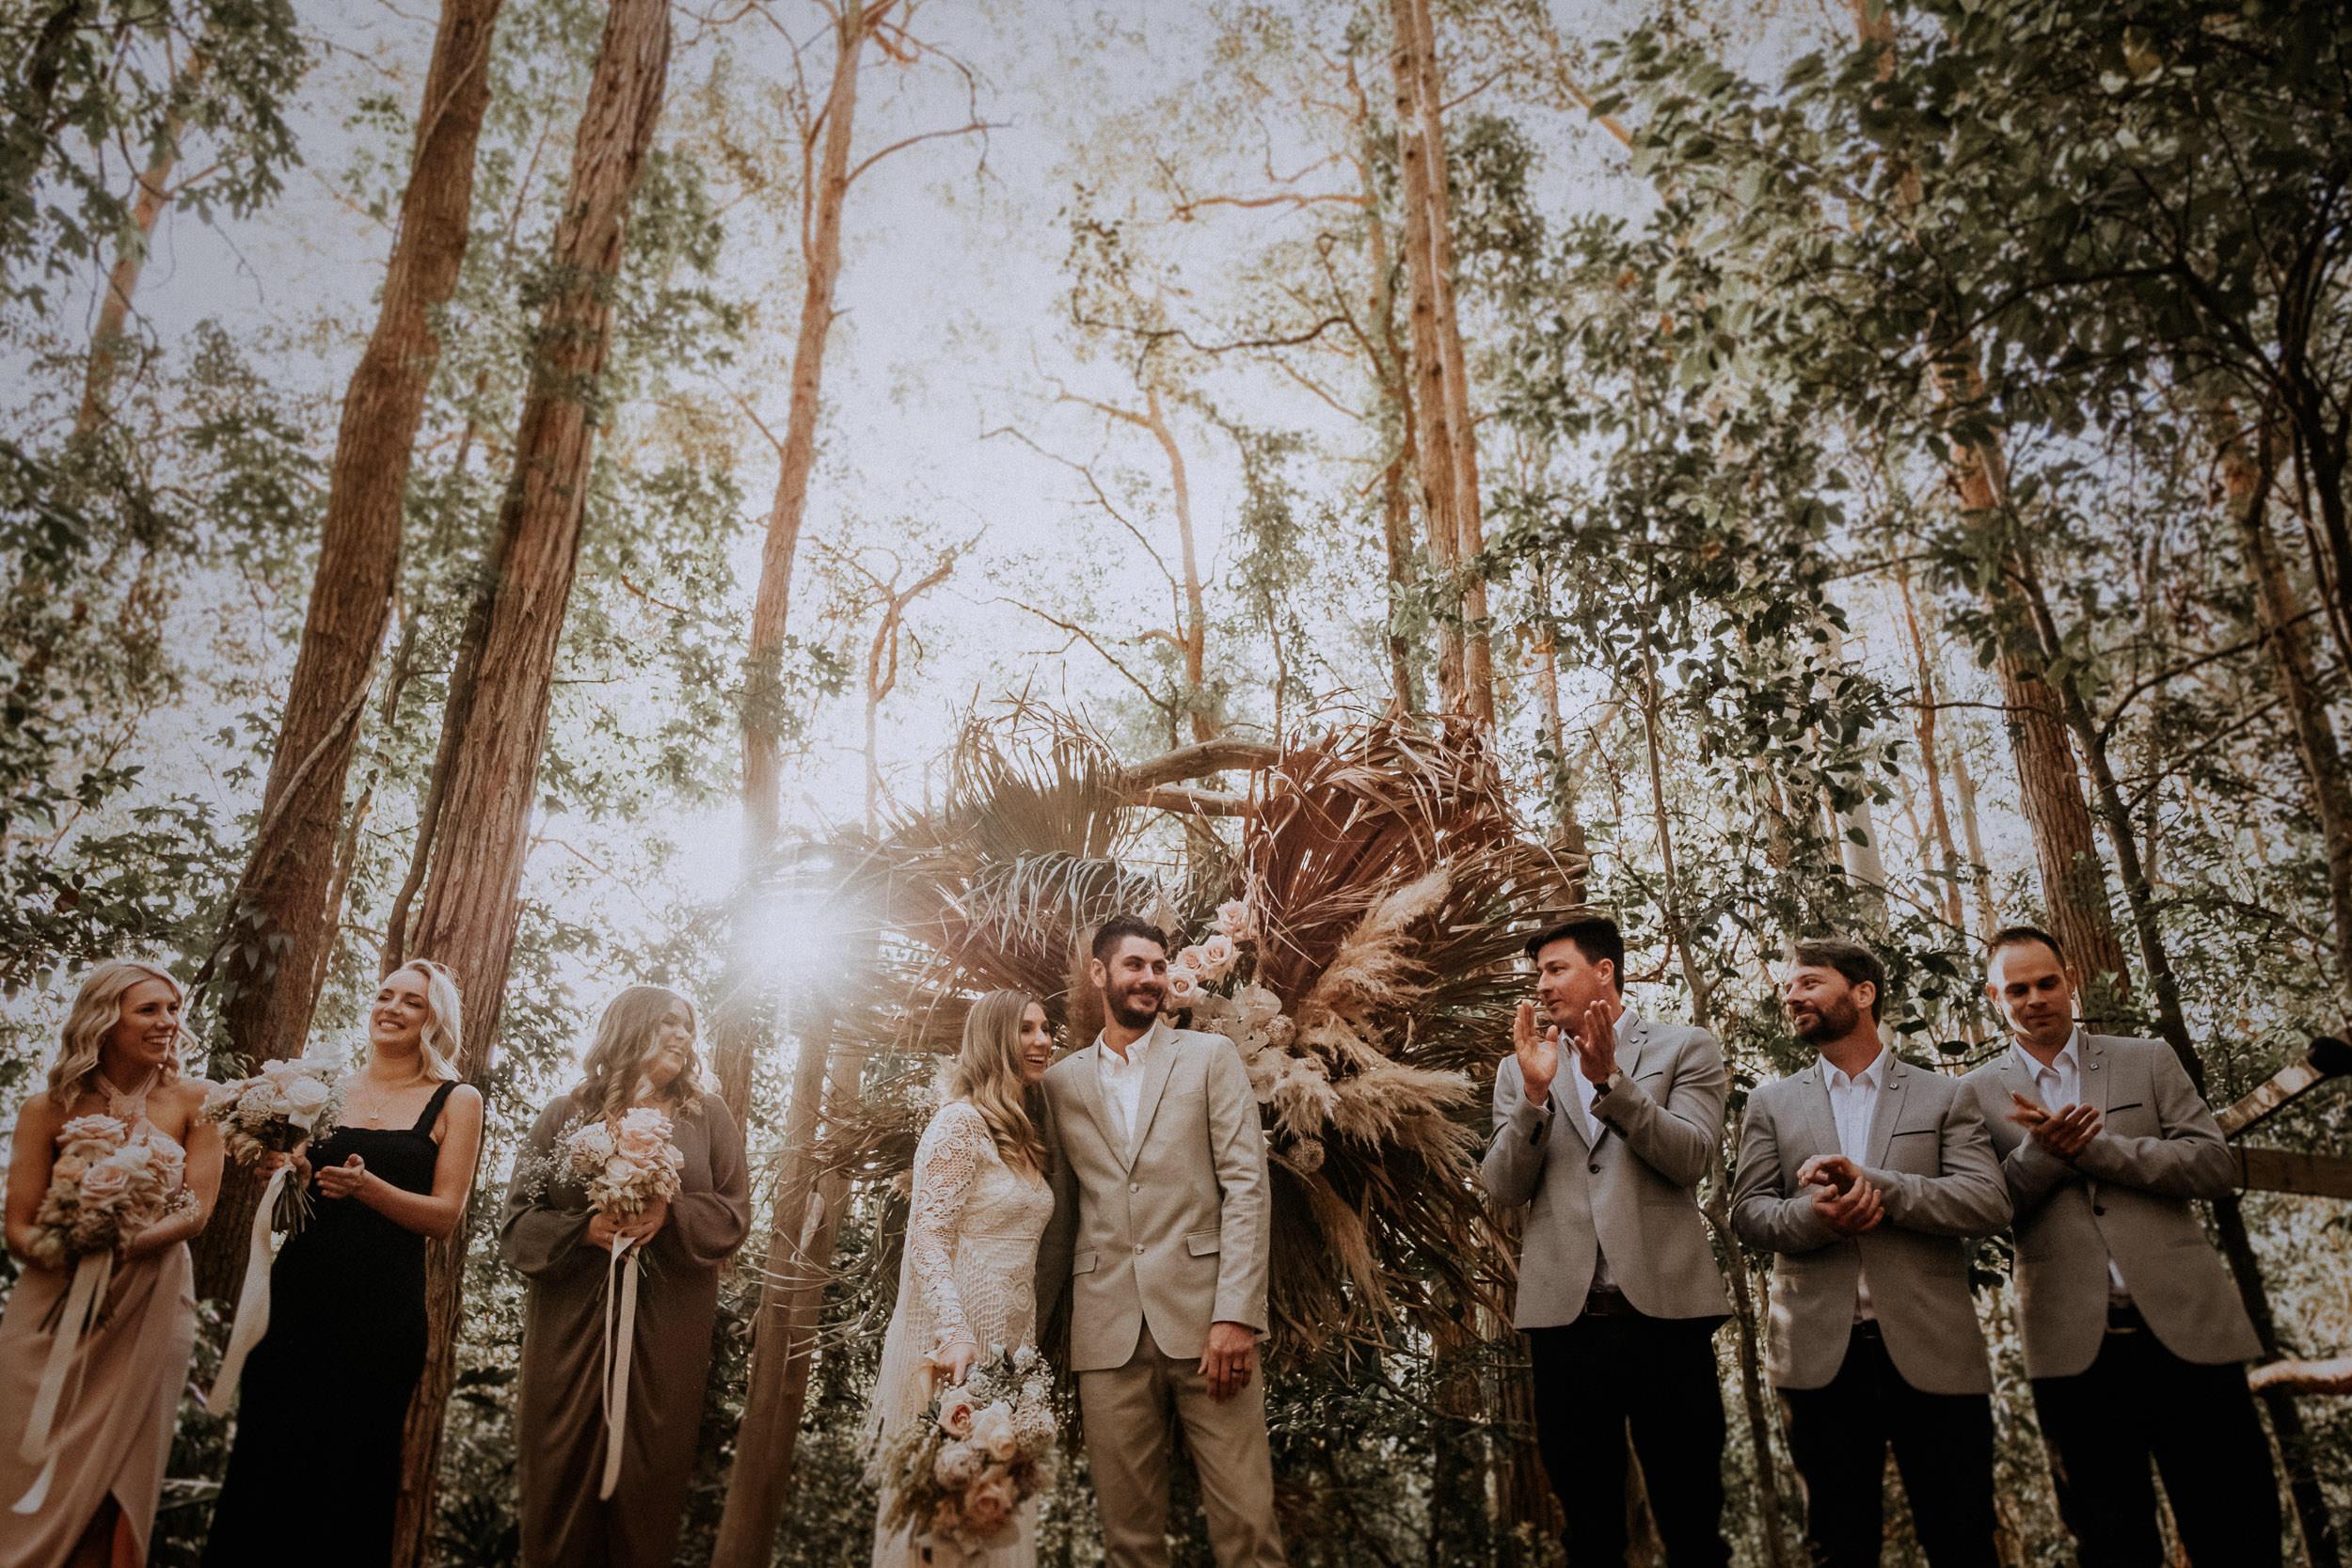 S&A Elopement - Kings & Thieves - Shred 'Til Dead - Central Coast Beach Forest Wedding - 266.jpg